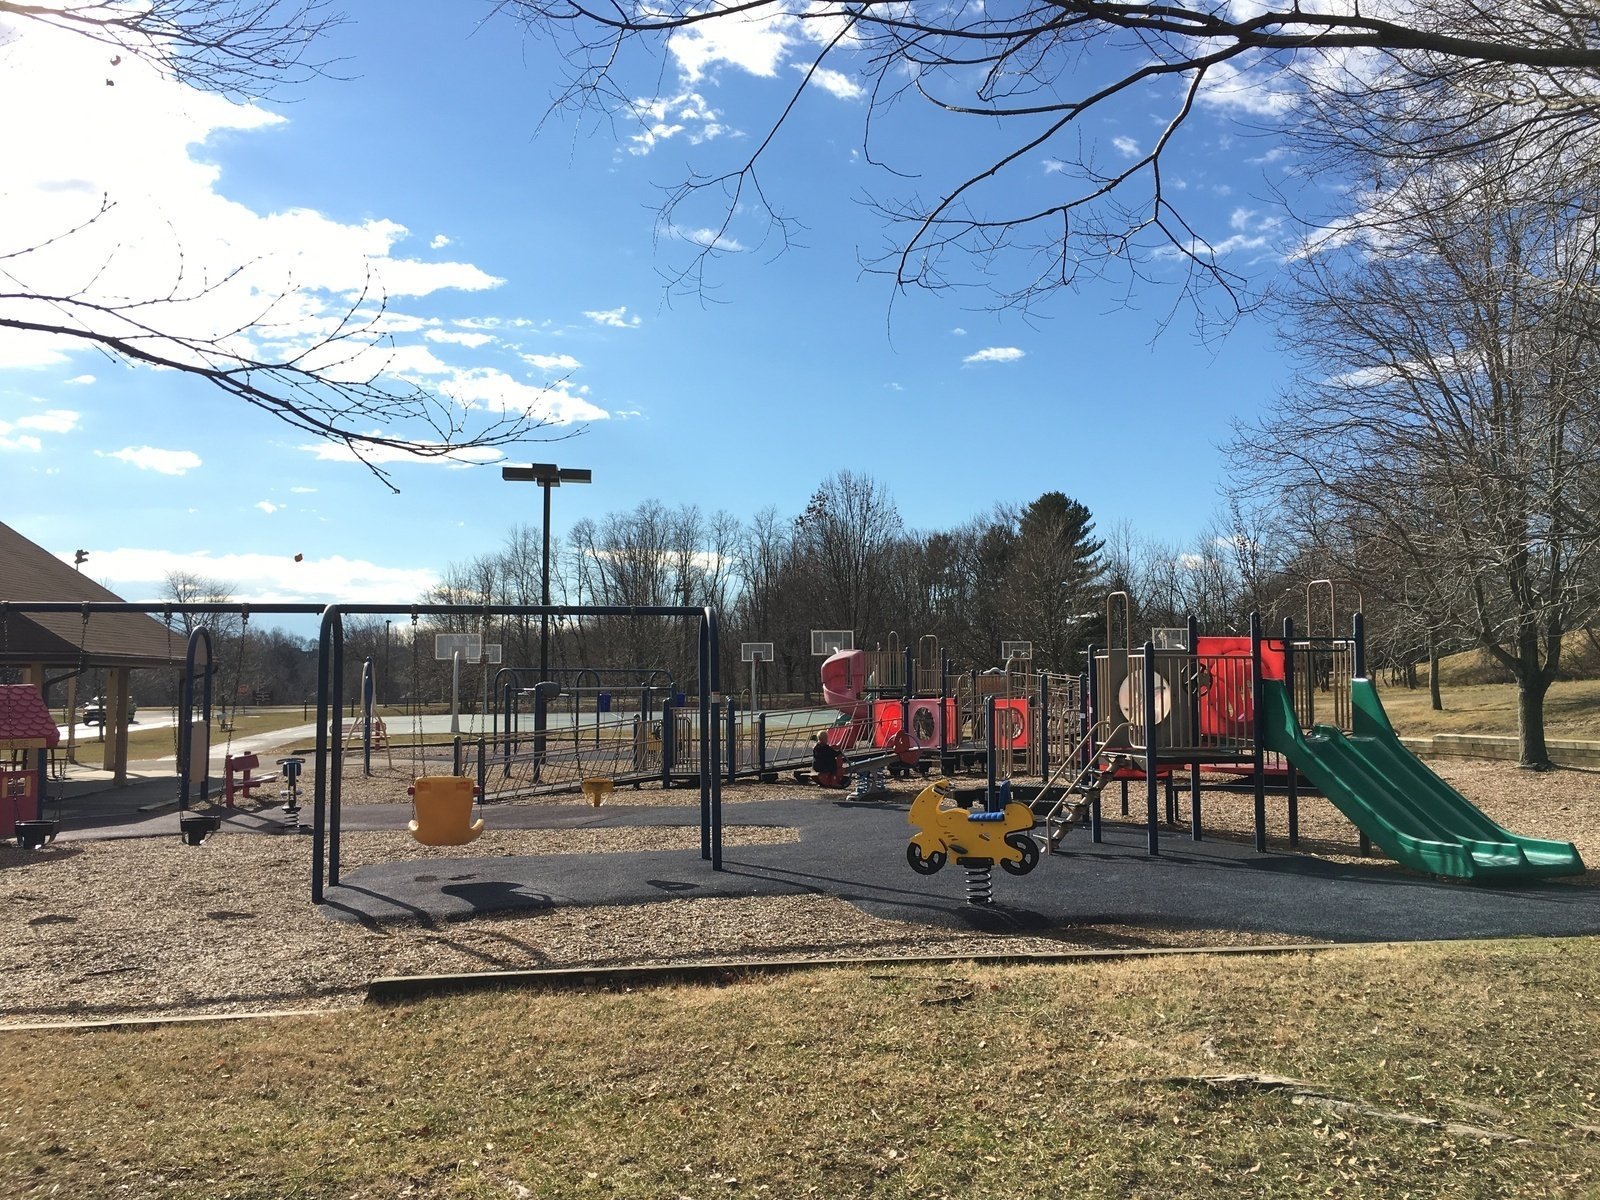 Martin Luther King Jr Recreational Park Silver Spring Md Kid Trekaroo